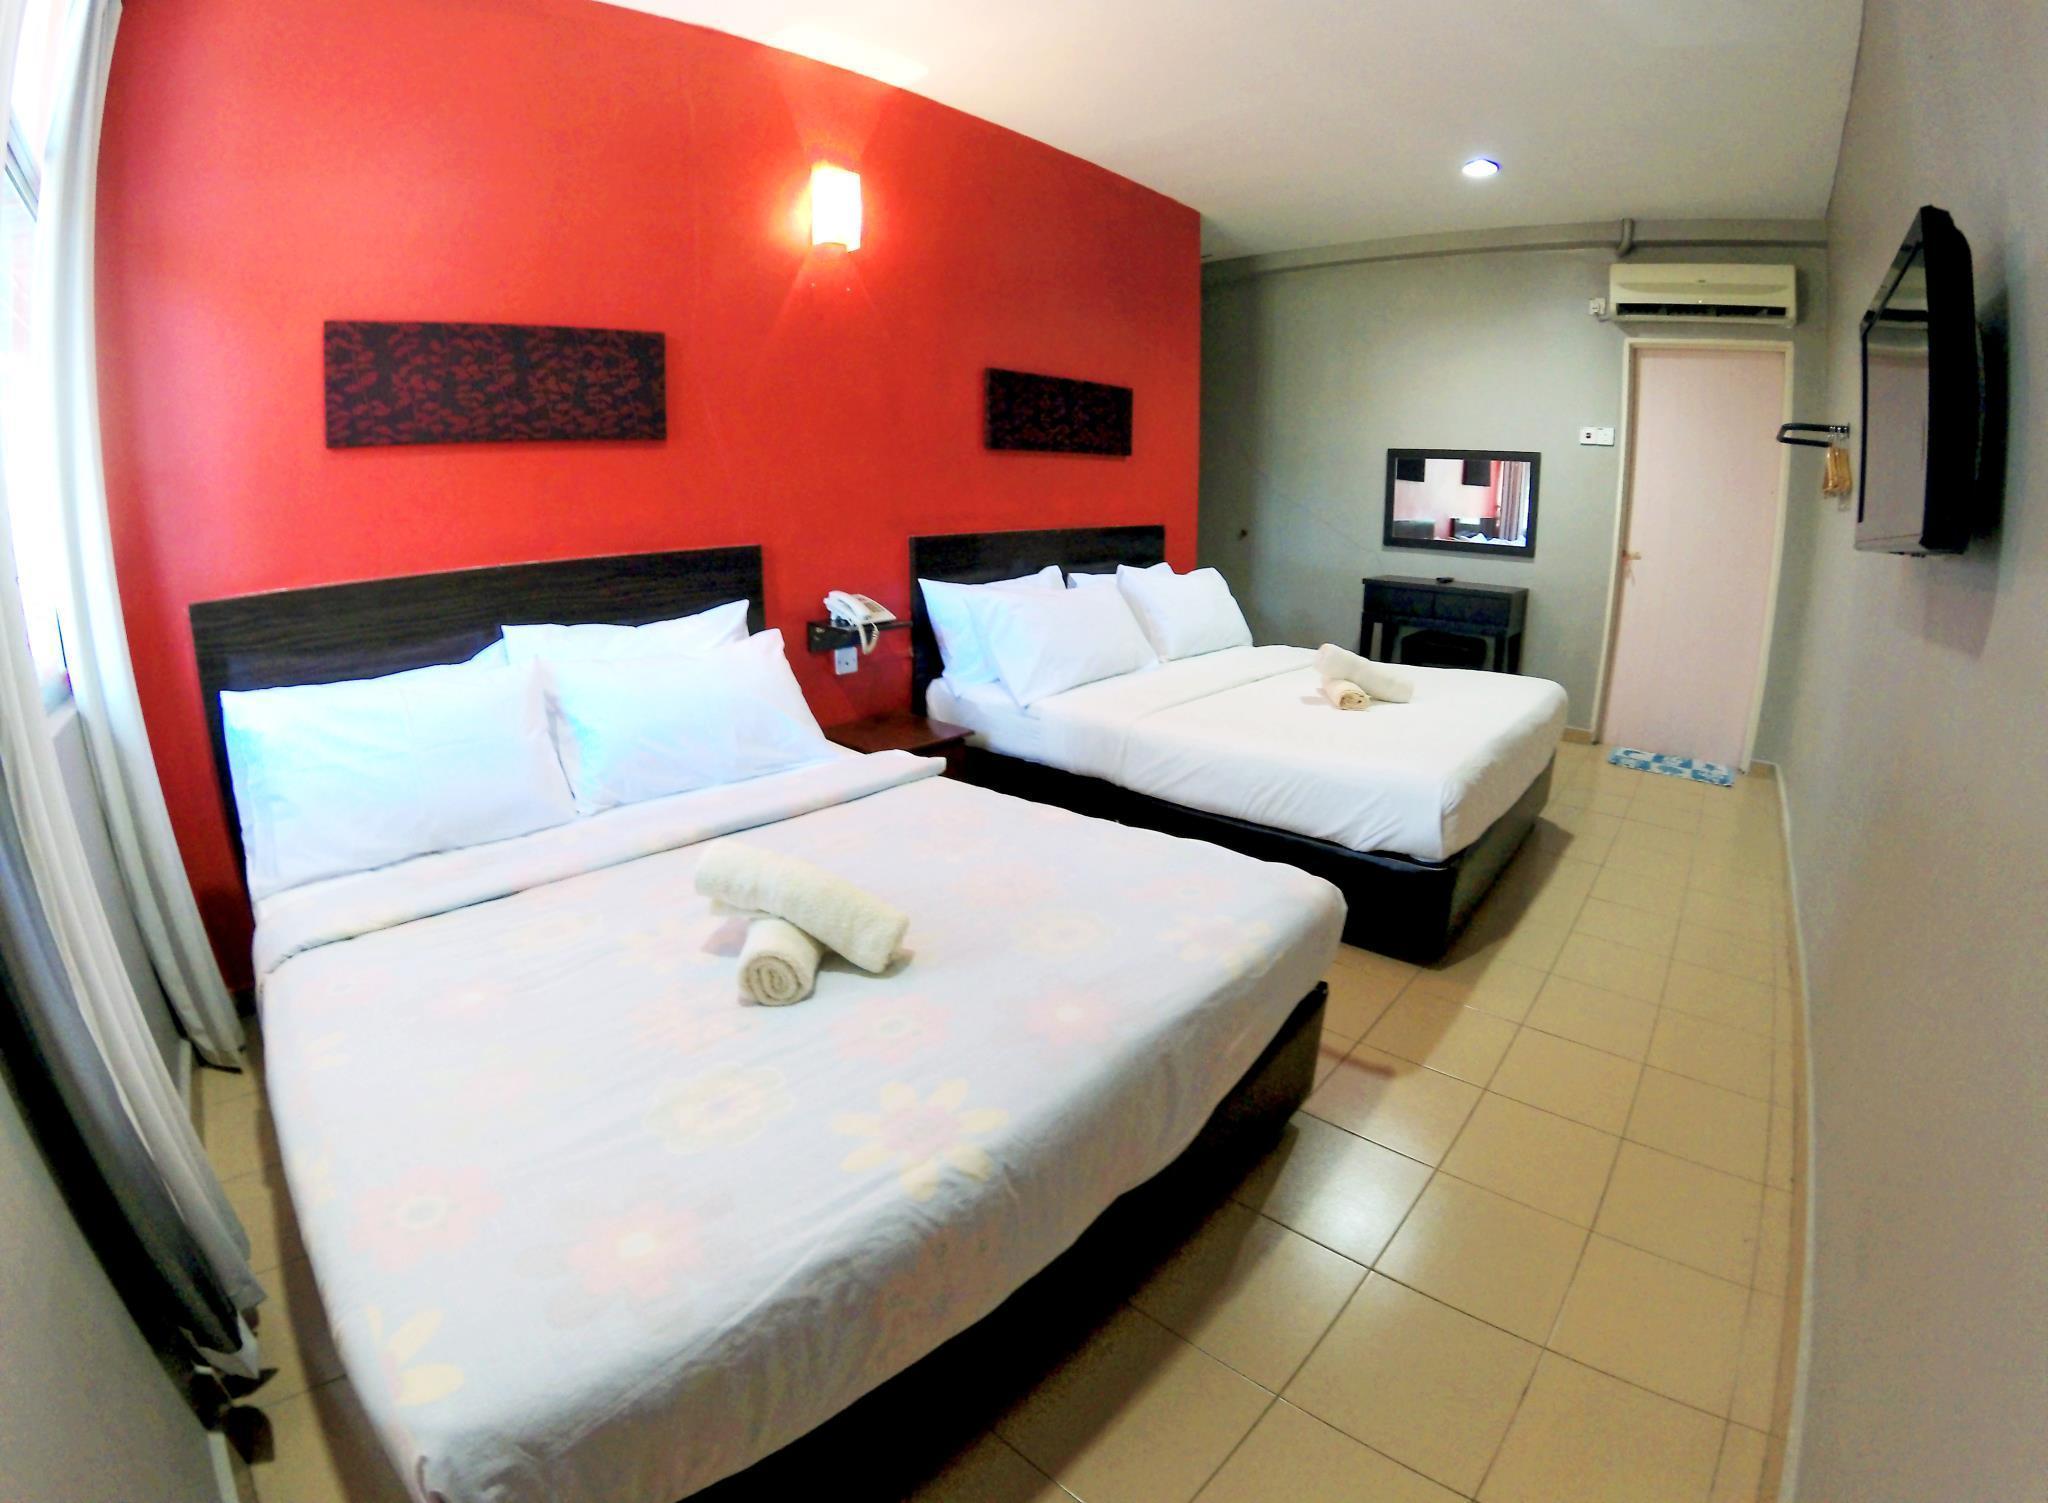 JV HOTEL @ Bandar Tasek Mutiara, Seberang Perai Selatan